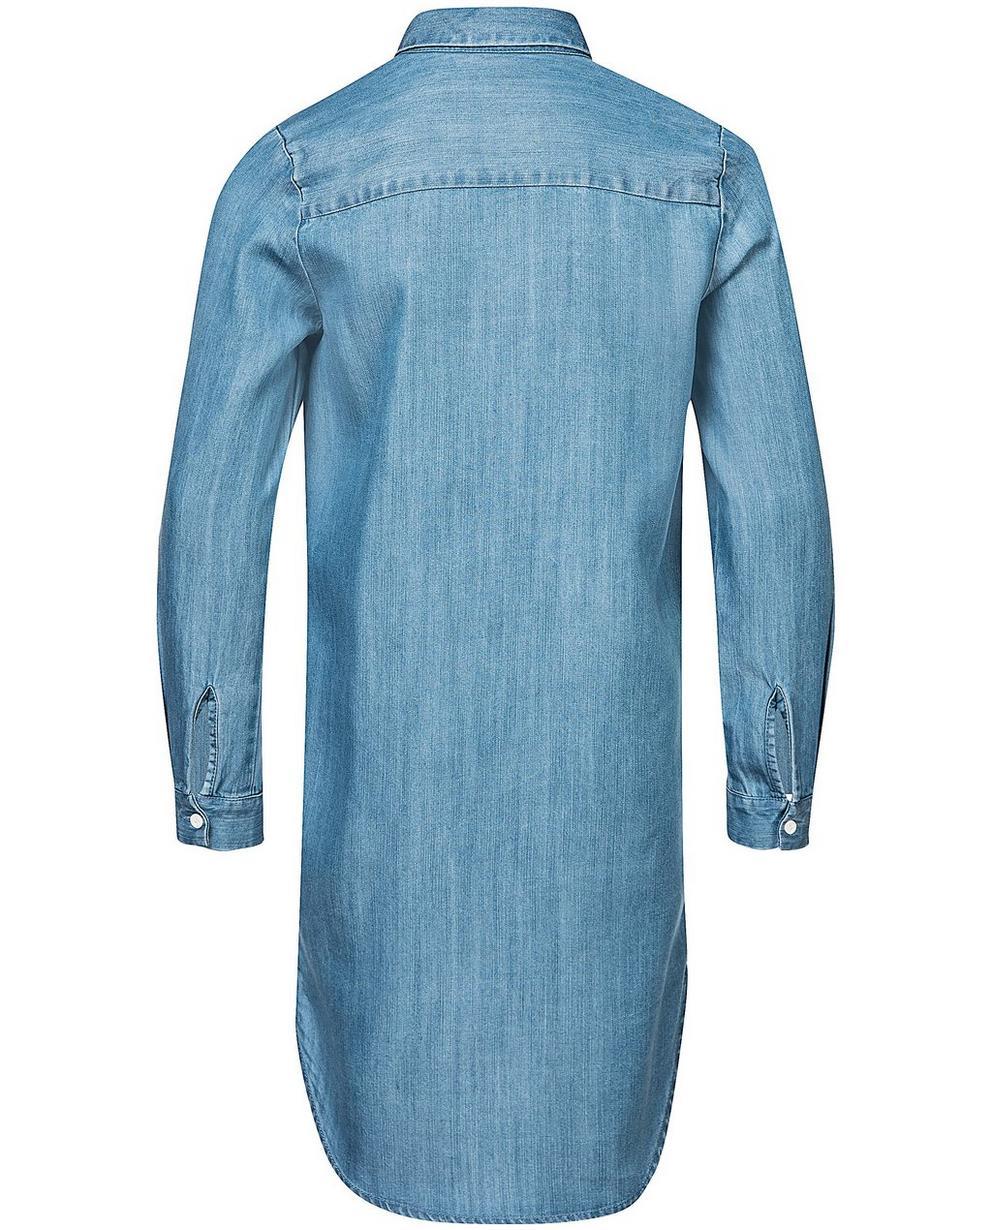 Kleider - Aqua - Lyocell-Hemdkleid mit Denim-Look